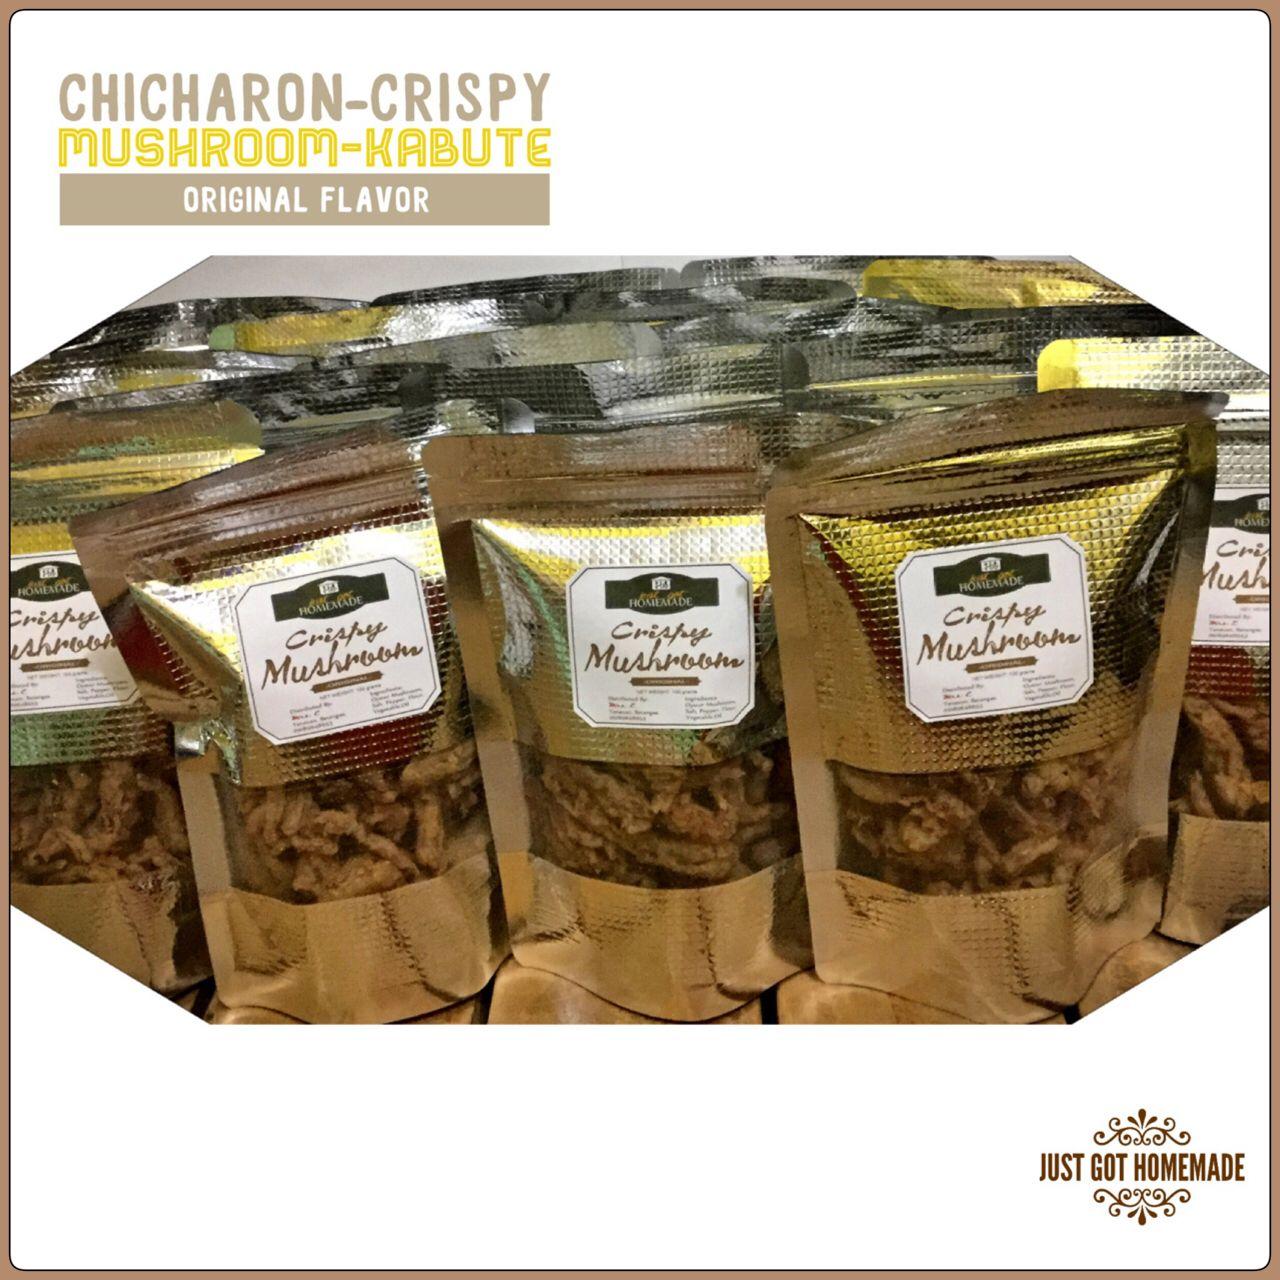 Jgh Crispy Mushroom Chicharon Kabute Just Got Homemade